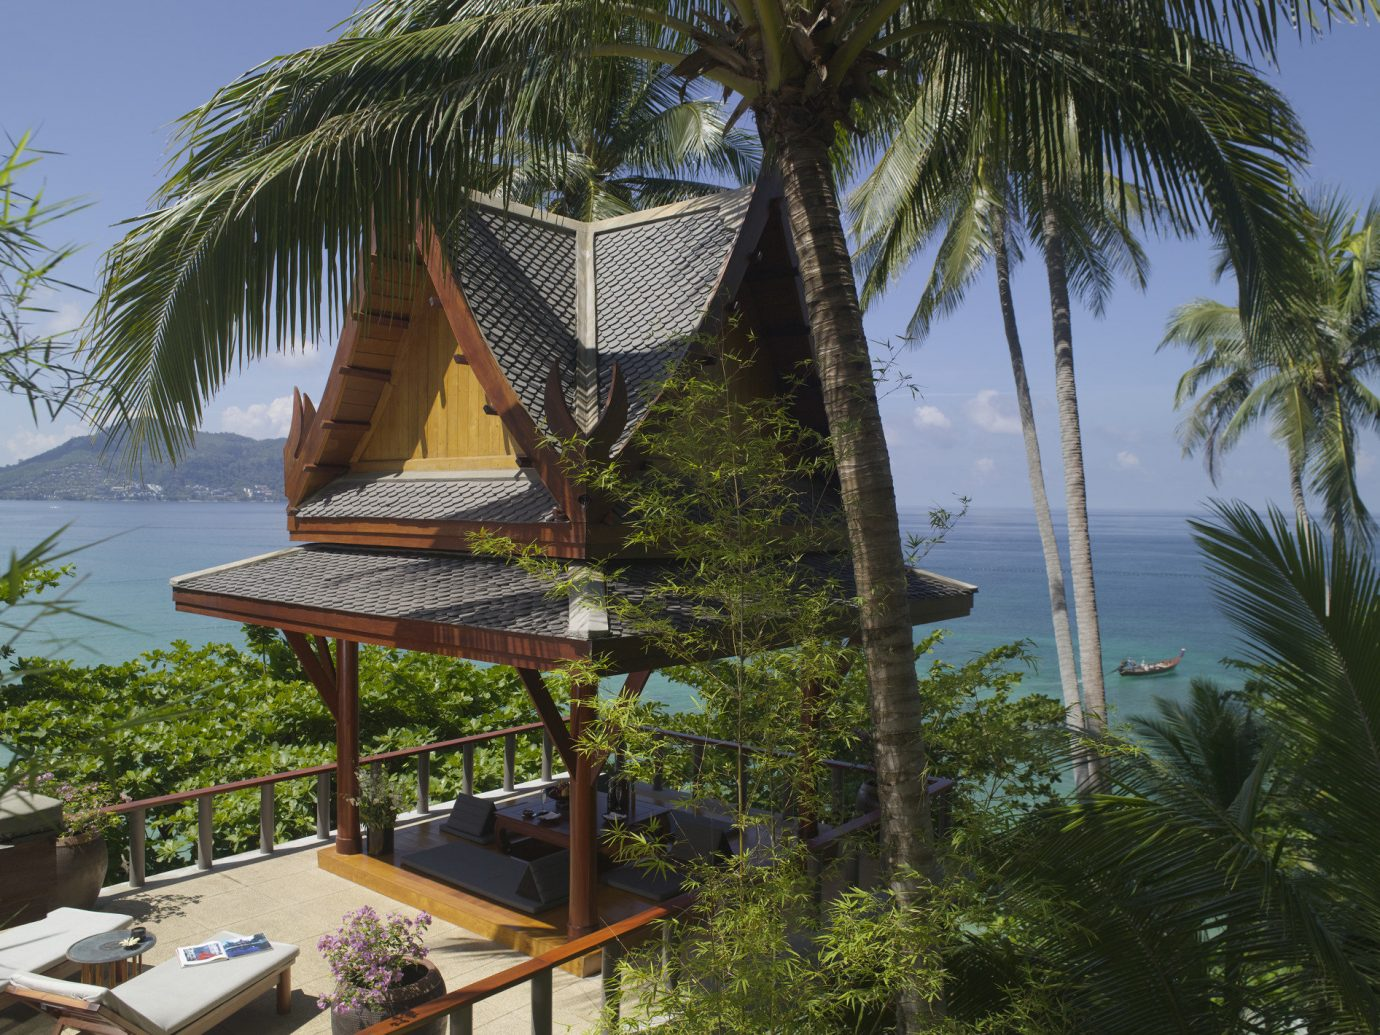 Hotels tree outdoor sky plant property Resort vacation arecales palm tropics Beach Jungle estate Villa caribbean palm family lined shade